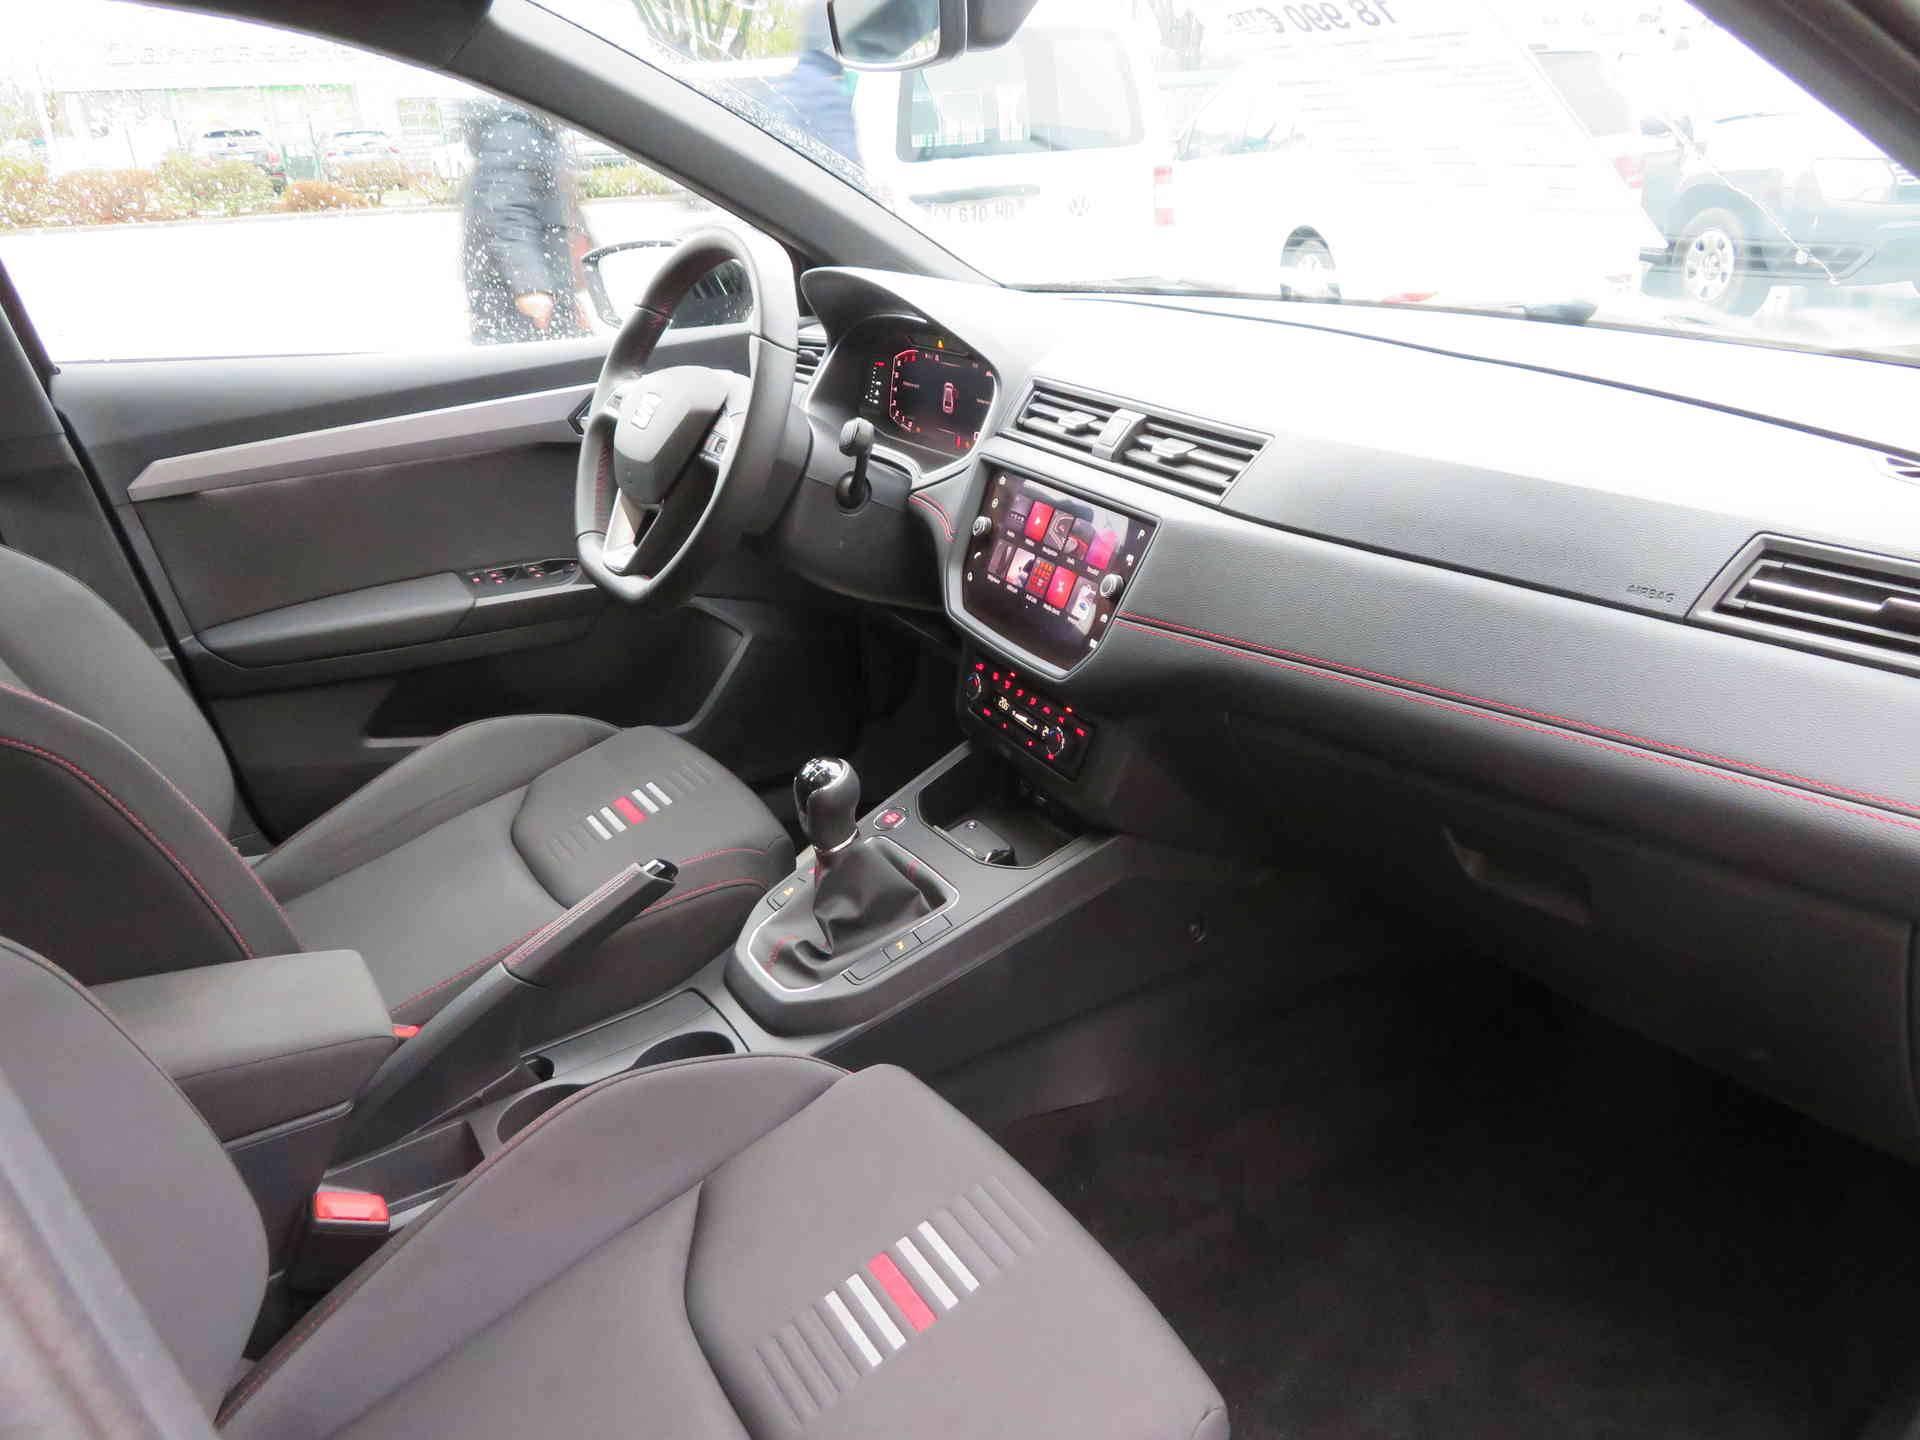 9 - Ibiza 1.0 EcoTSI 115 ch S/S BVM6